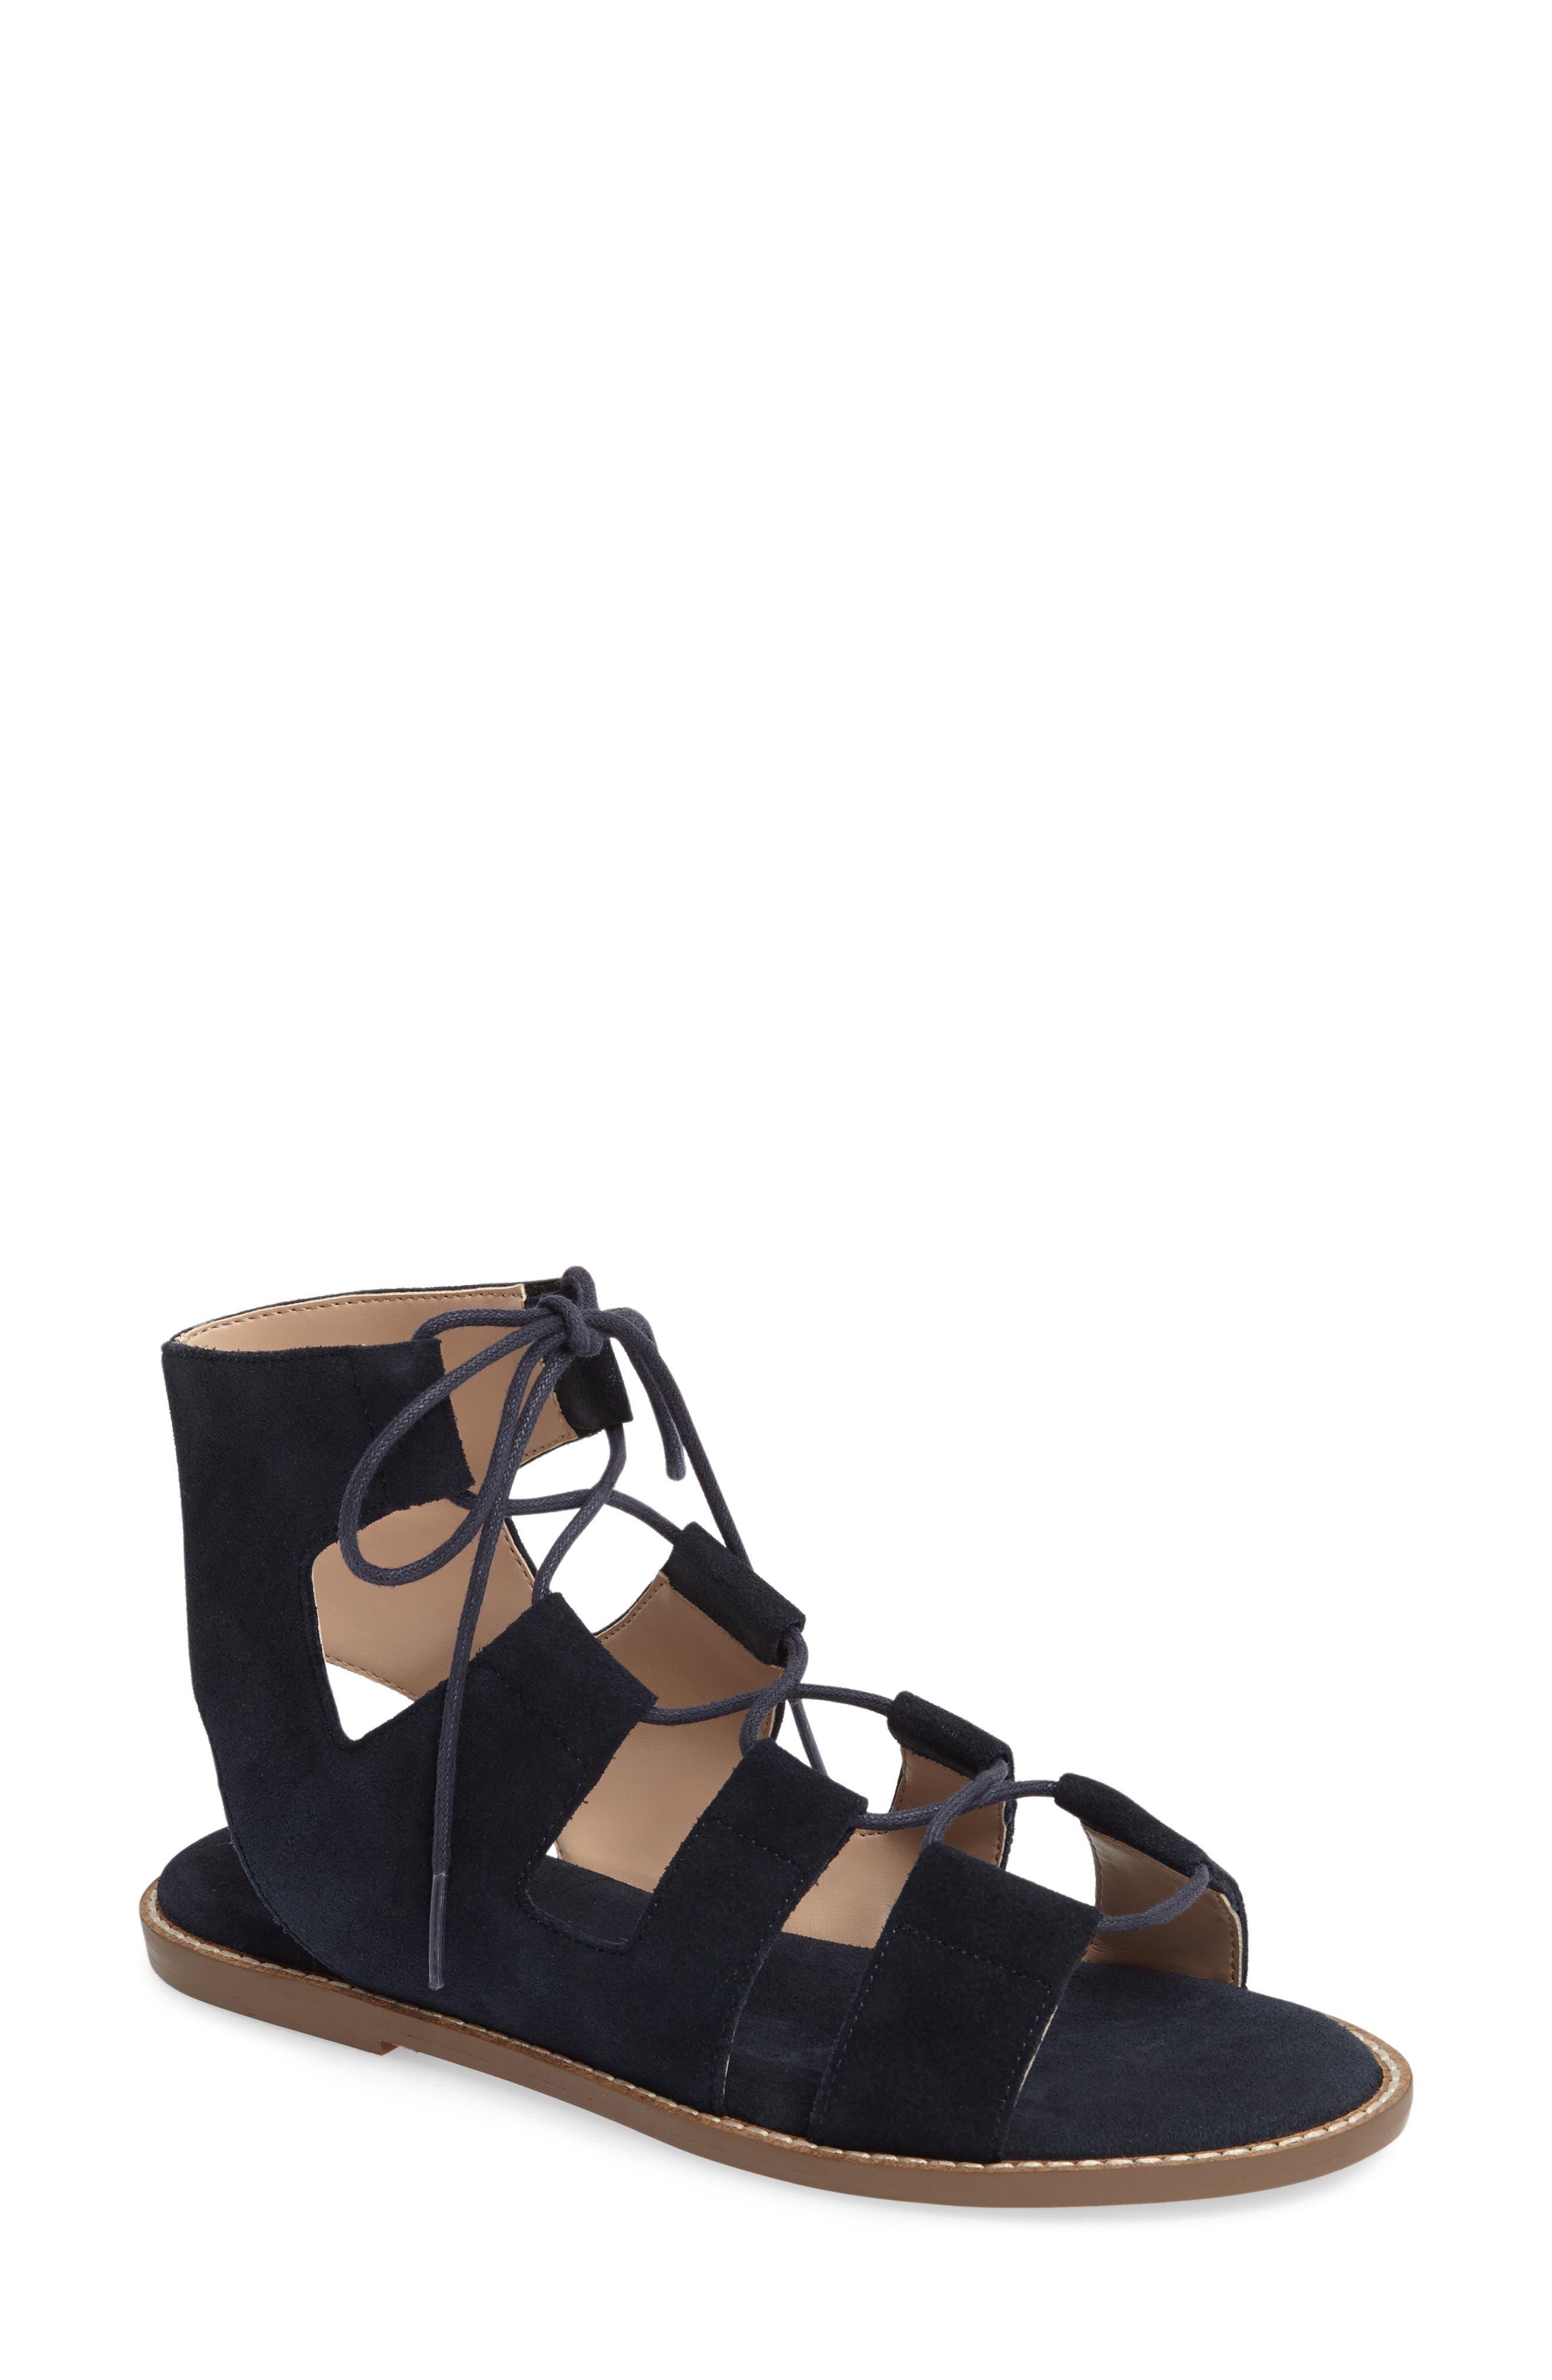 Sole Society 'Cady' Lace-Up Flat Sandal (Women)